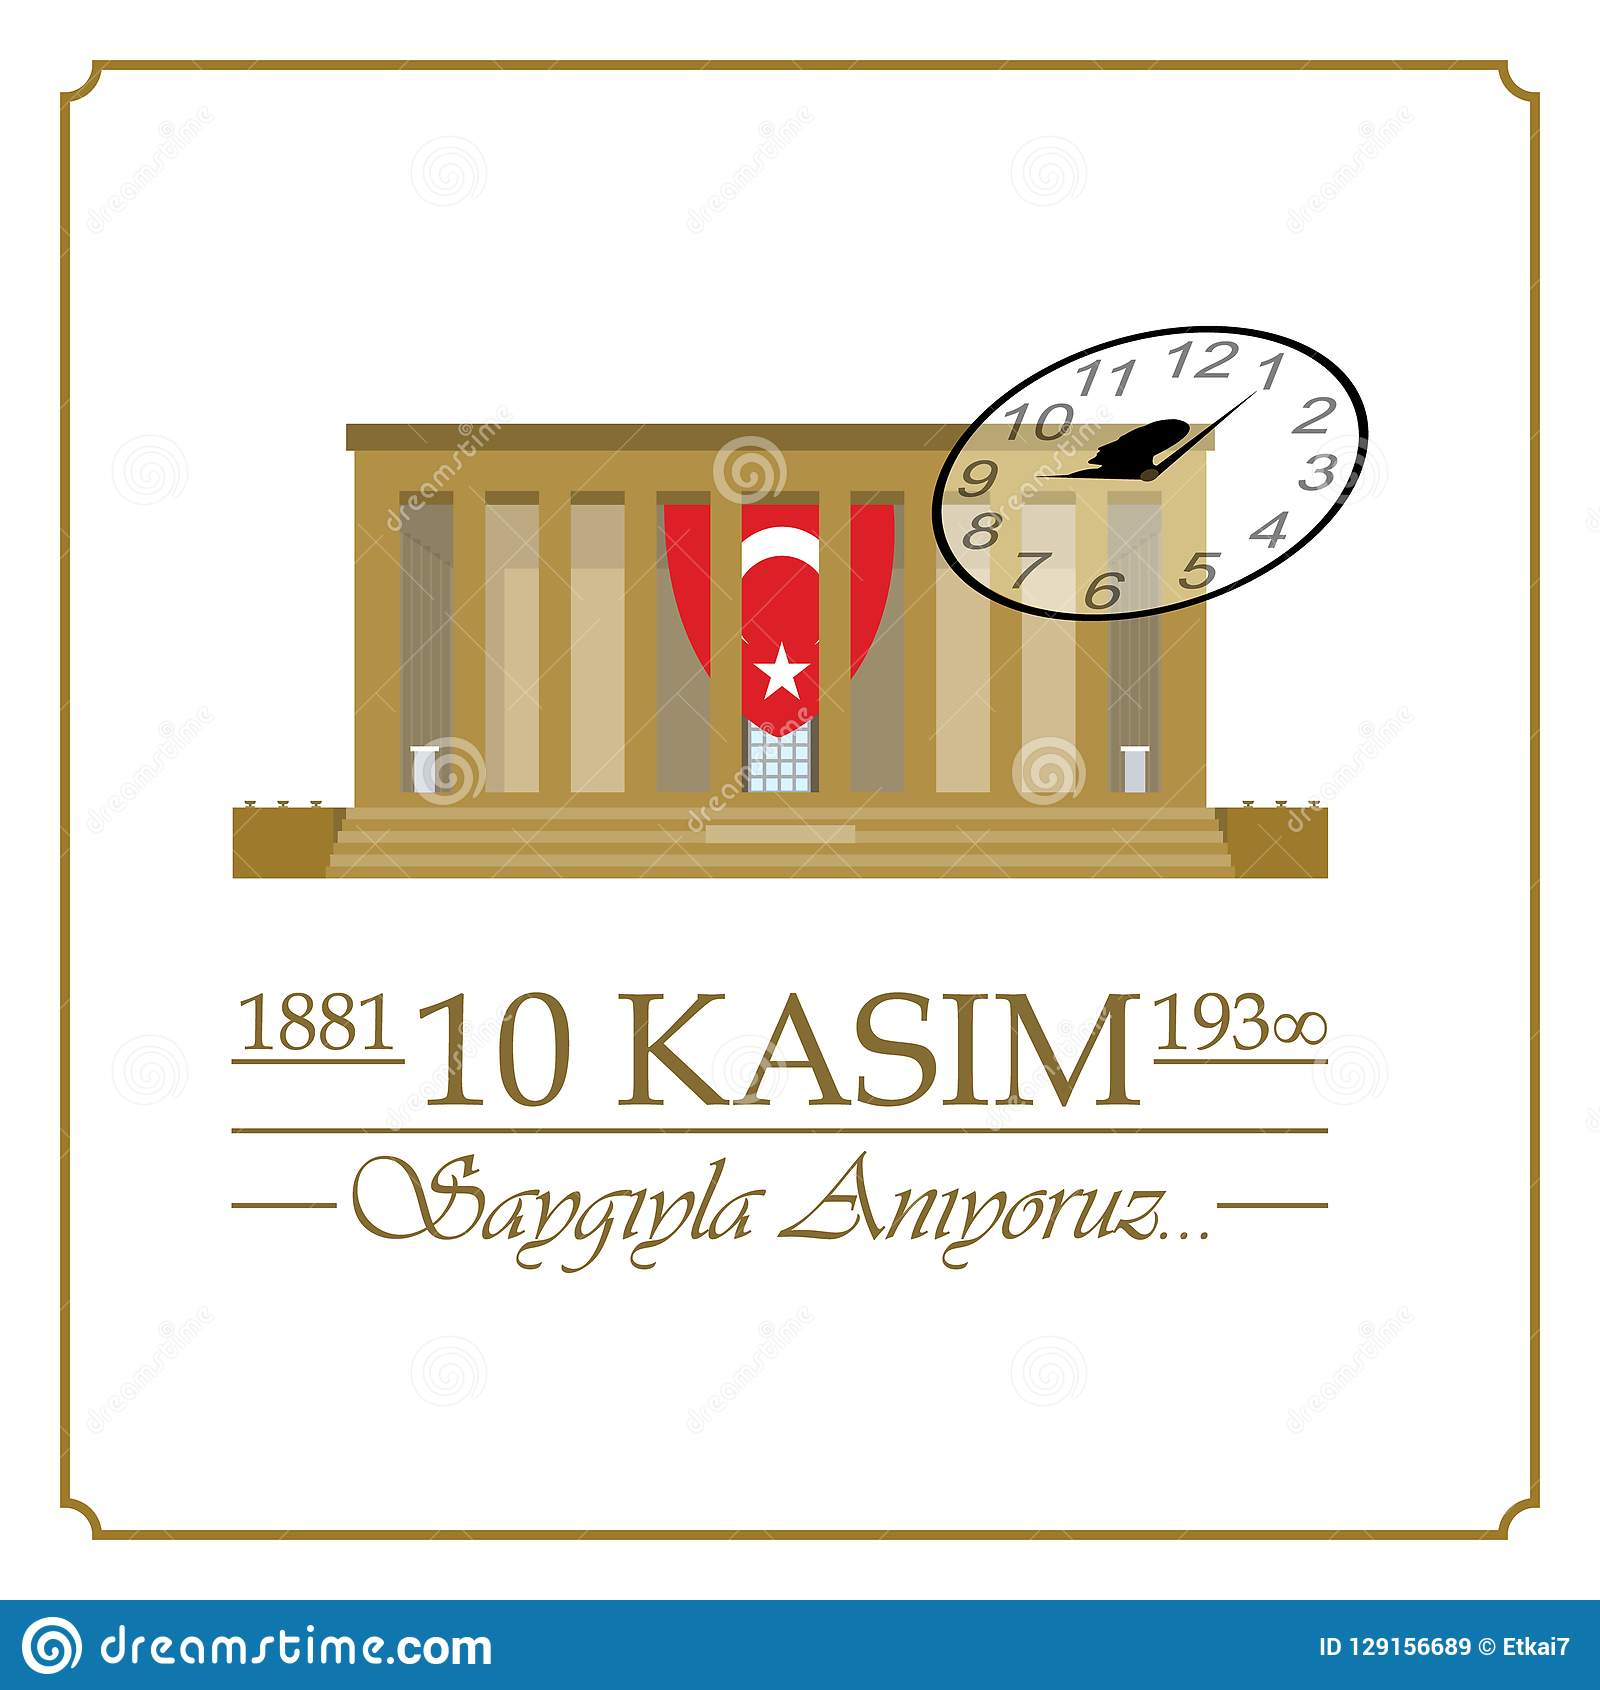 10 November, Mustafa Kemal Ataturk Death Day-verjaardag